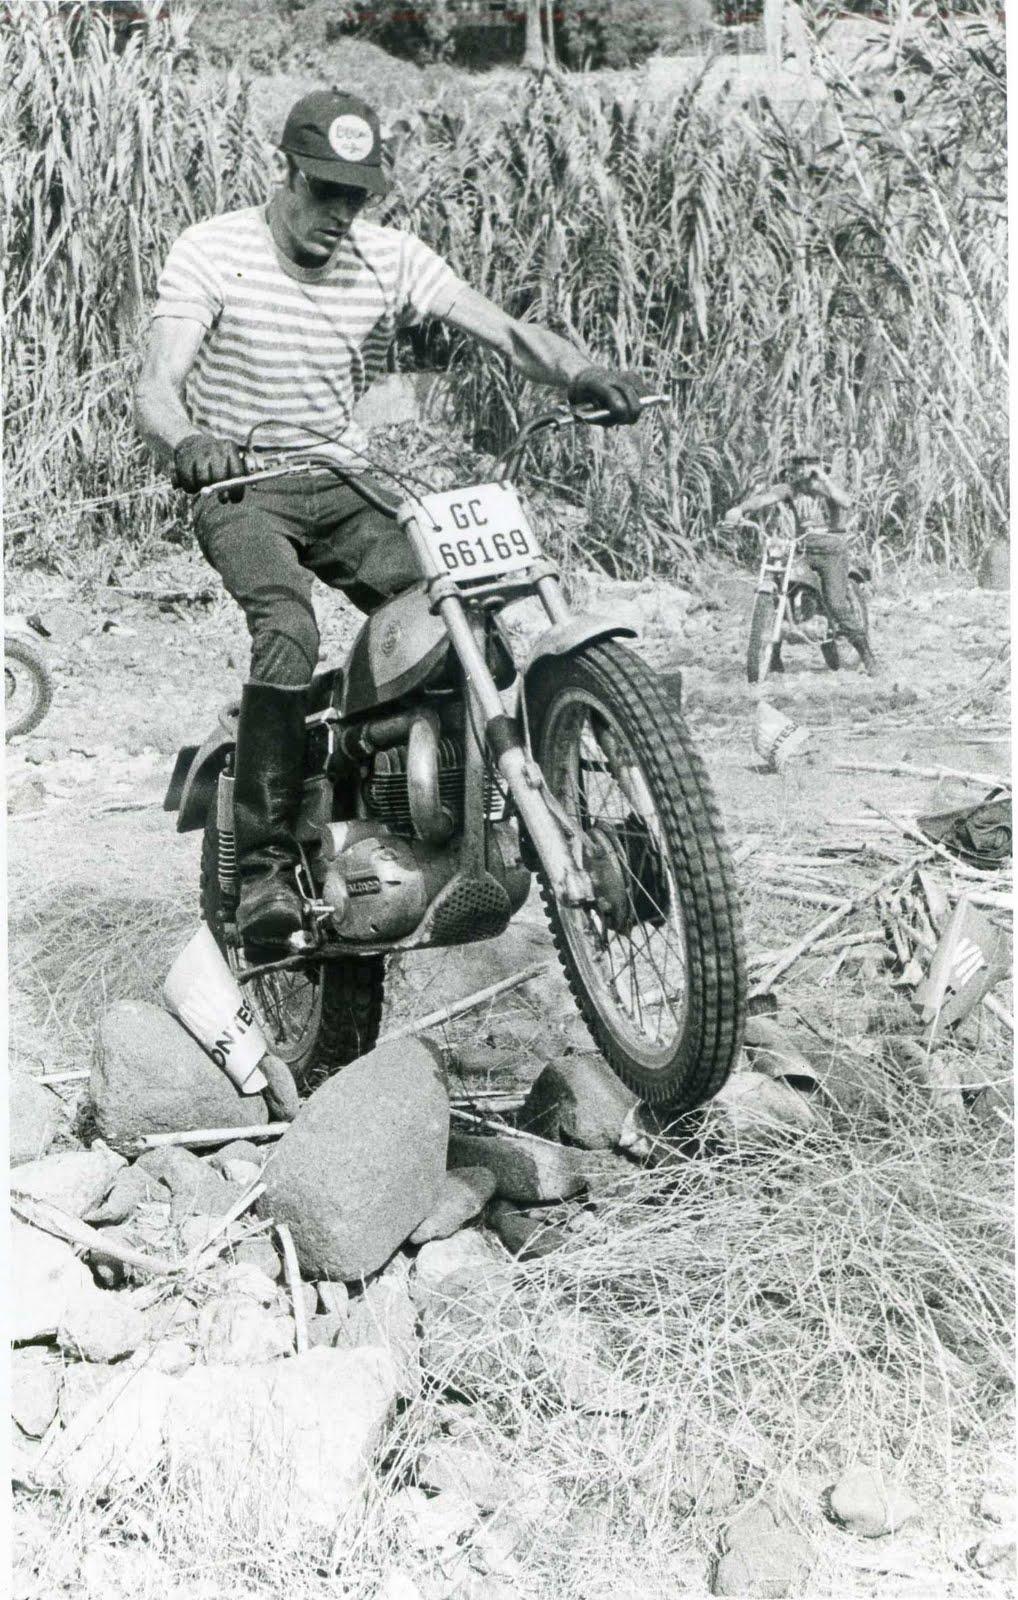 trial - Ducati 250 Trial 2.1